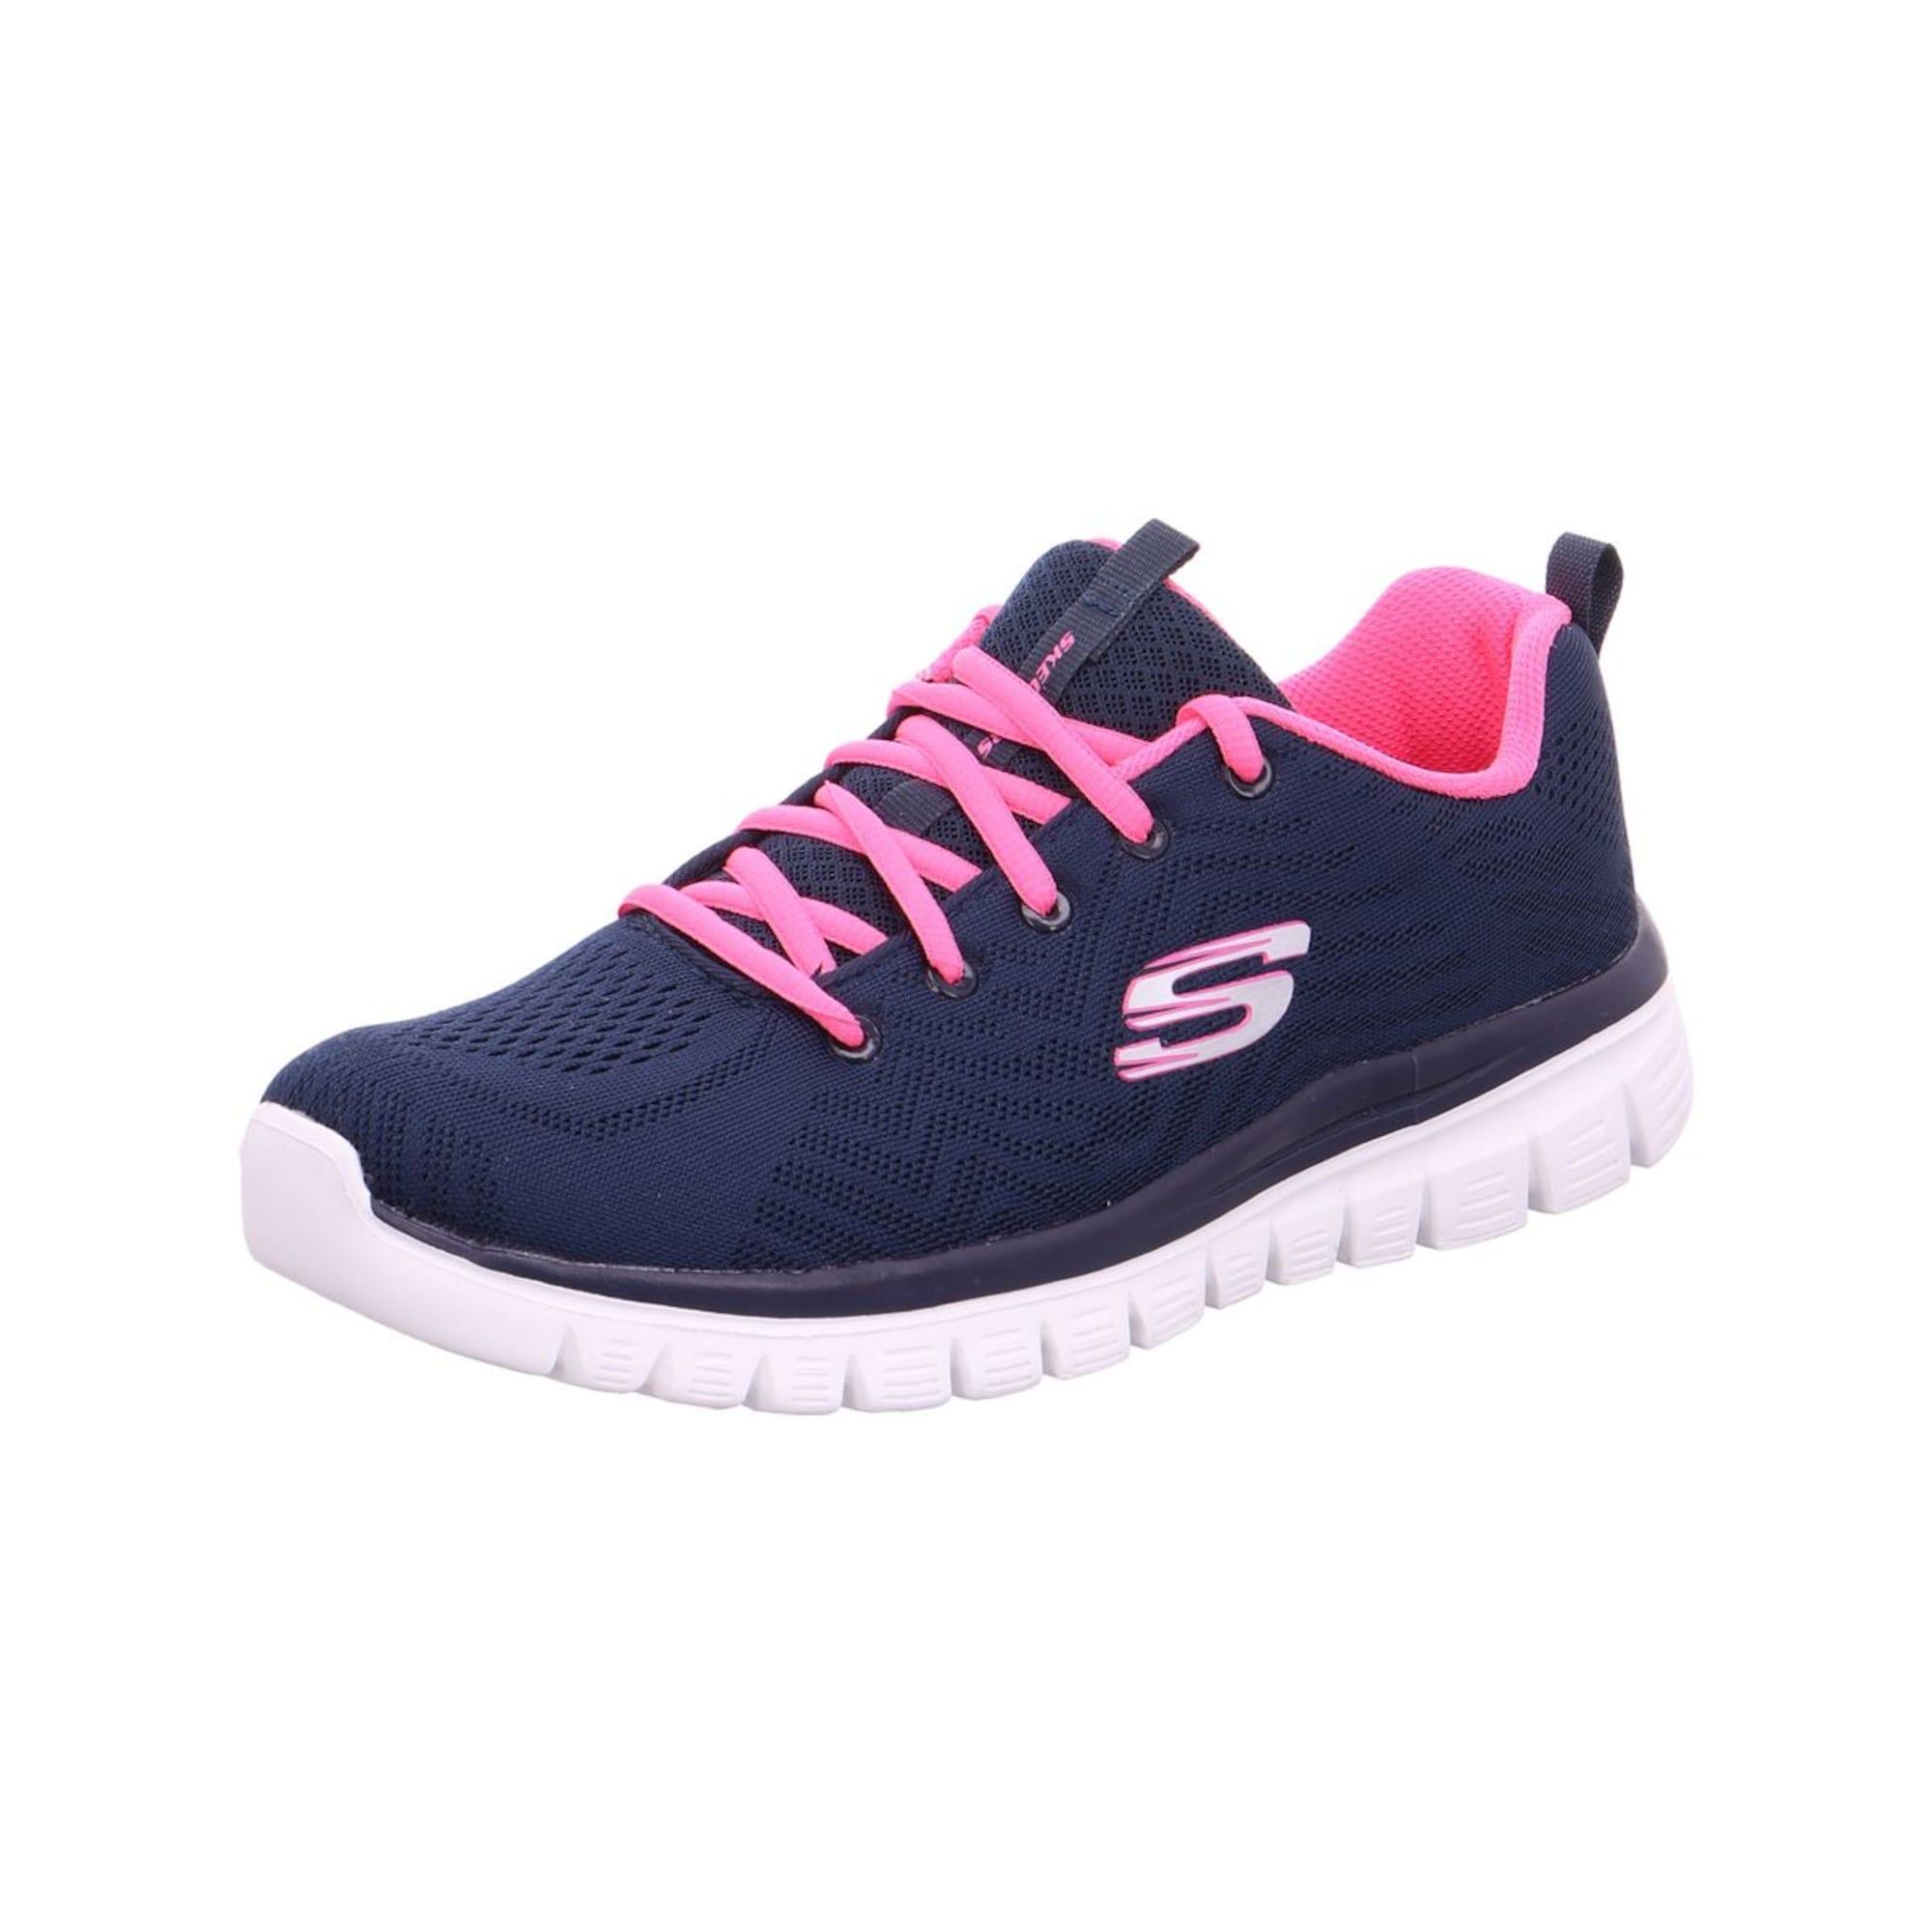 SKECHERS Šnurovacie topánky 'Graceful'  námornícka modrá / tmavoružová